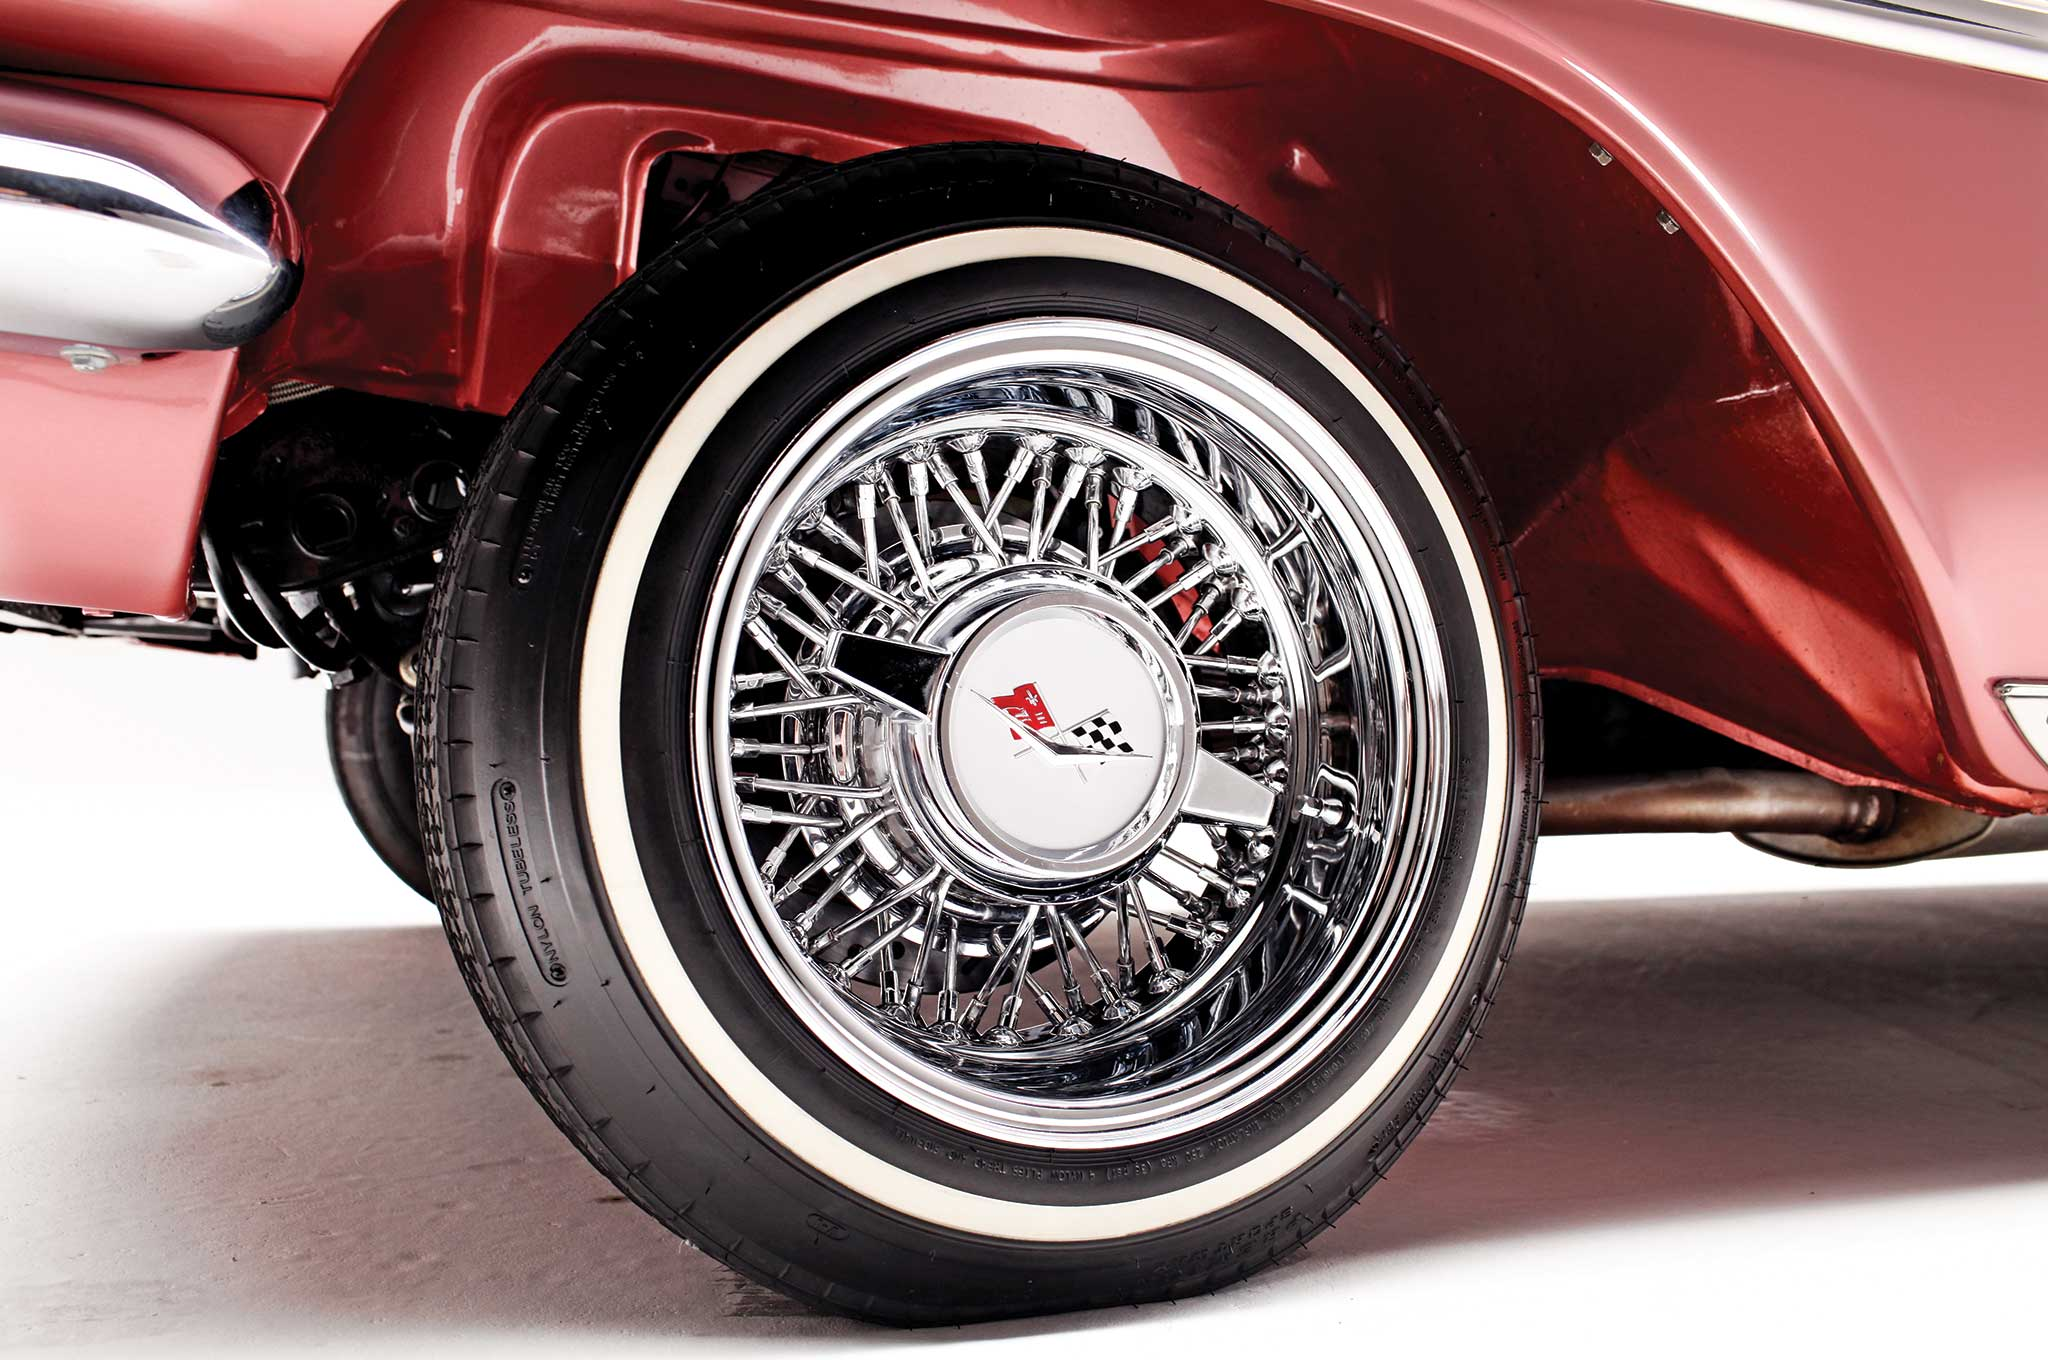 1959 Chevrolet Impala - Pinky's '59 - Lowrider